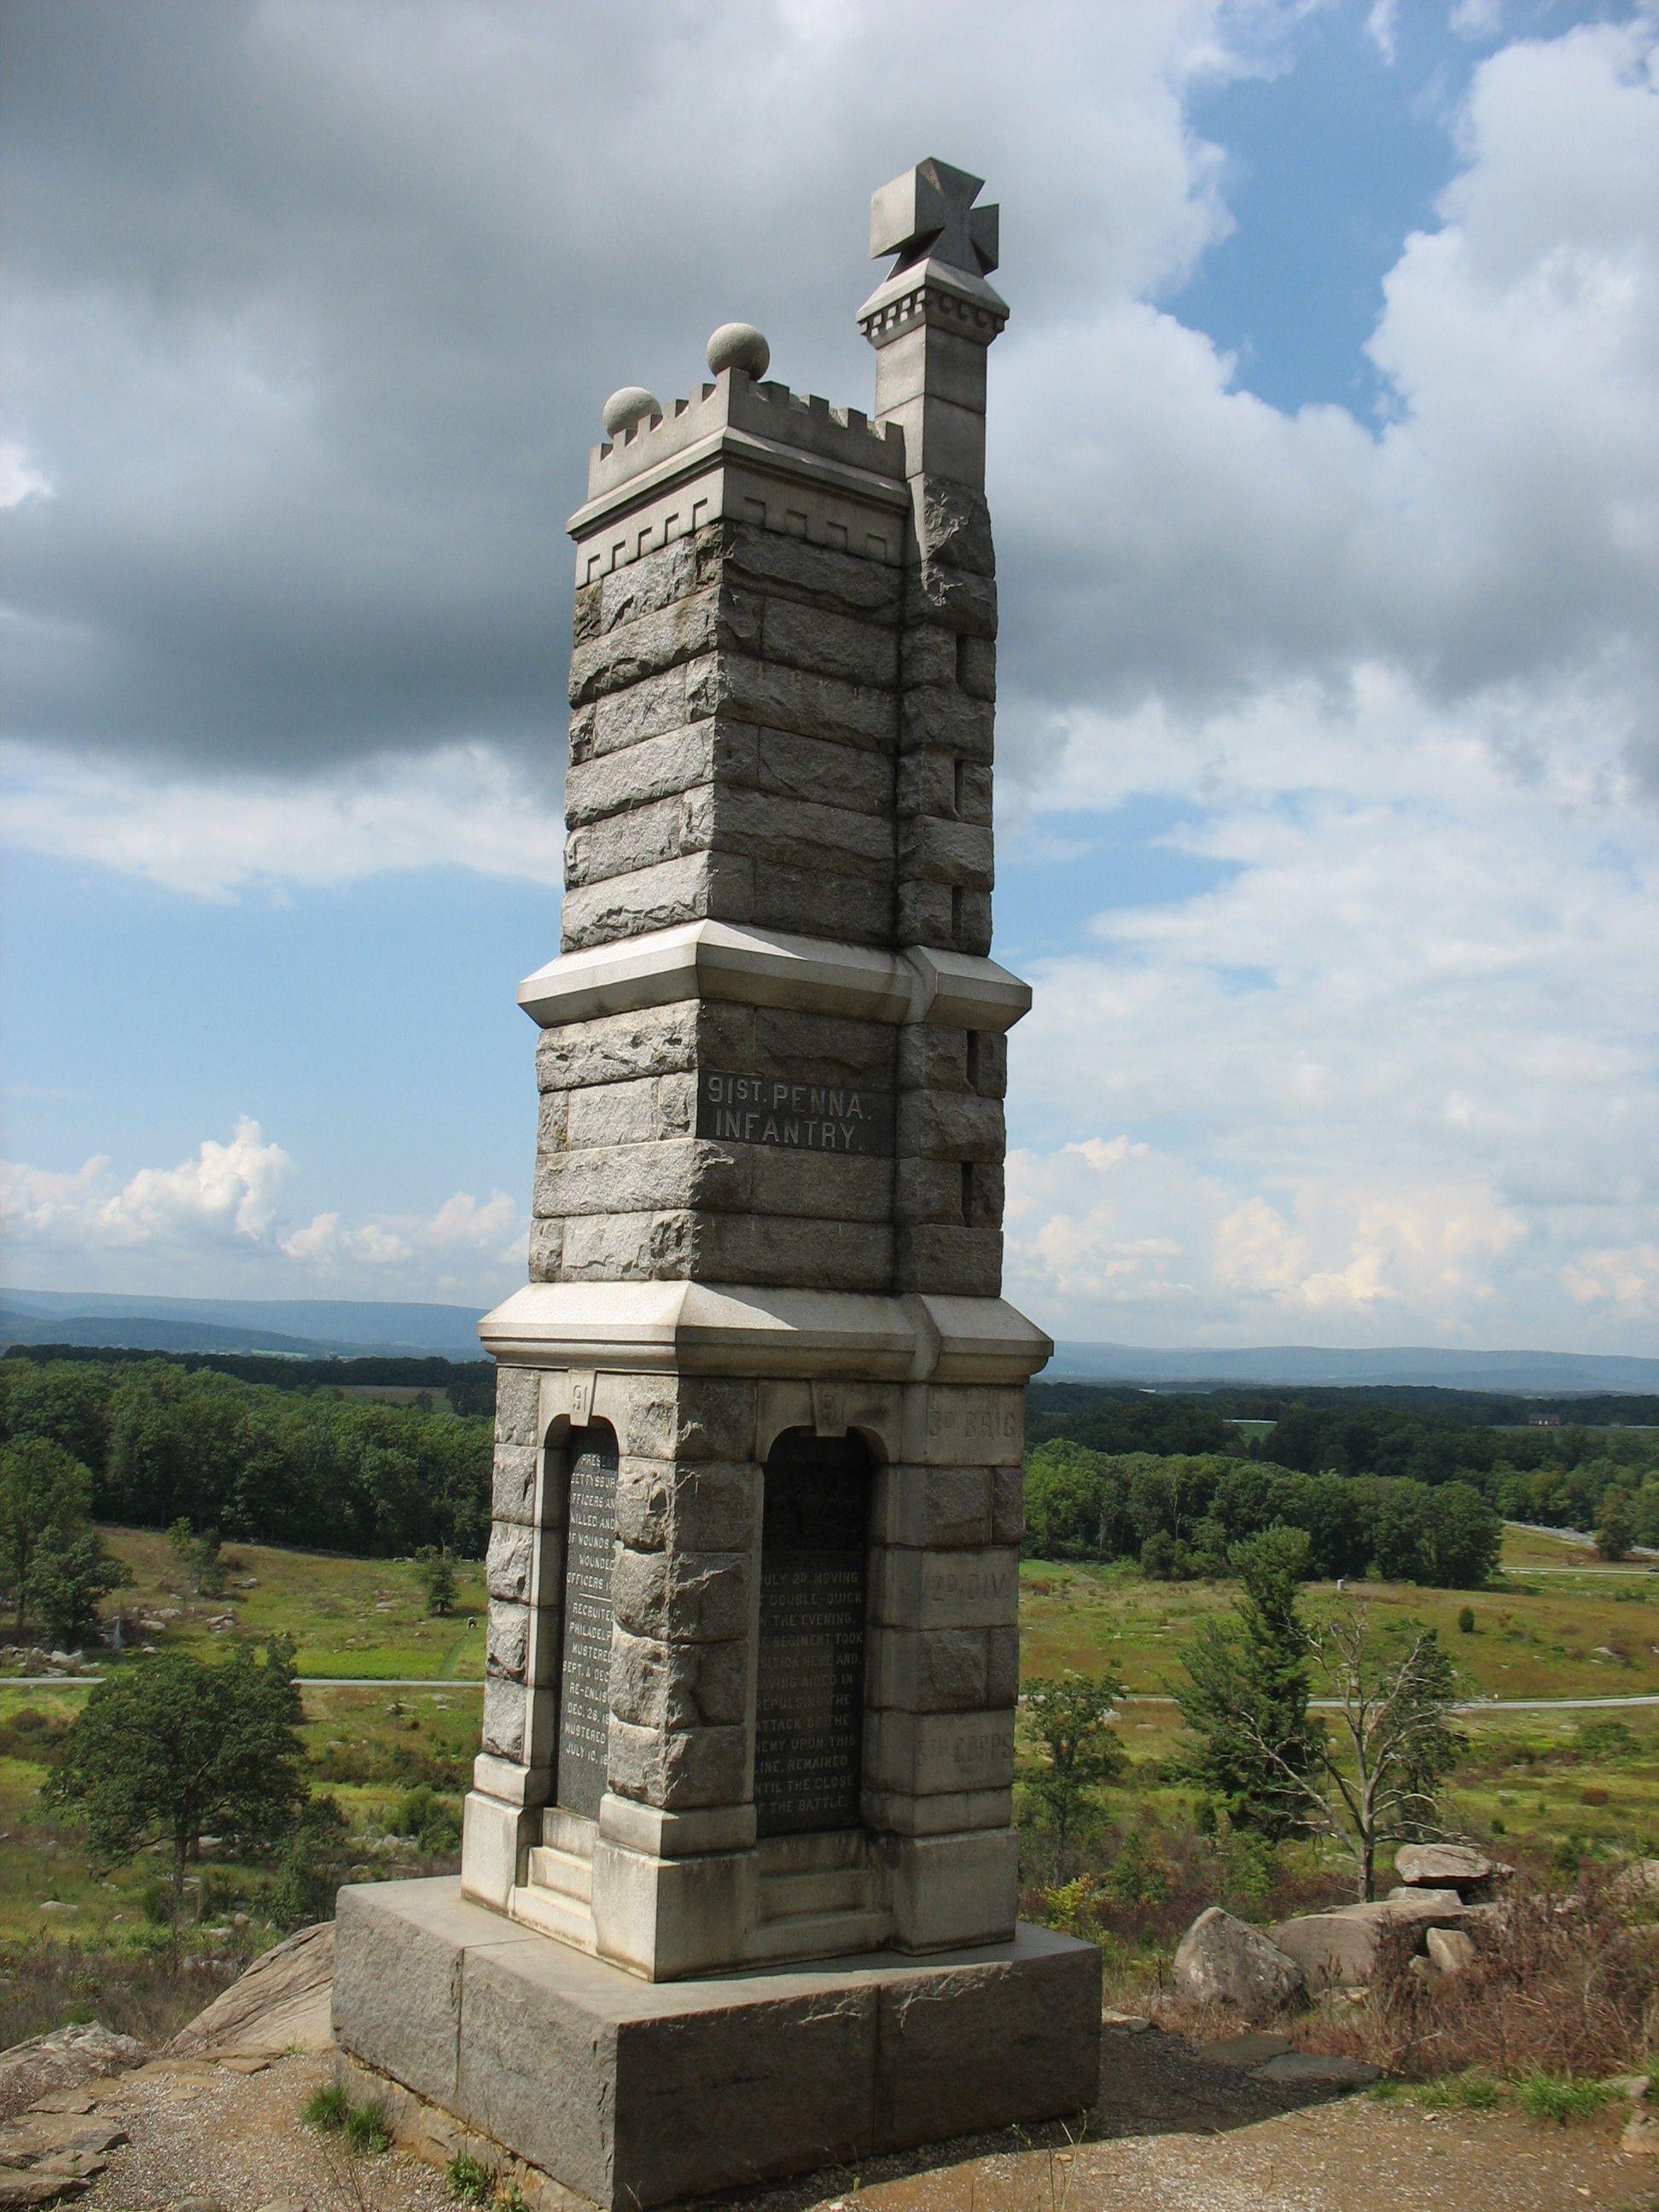 Gettysburg 150th Anniversary Can't wait